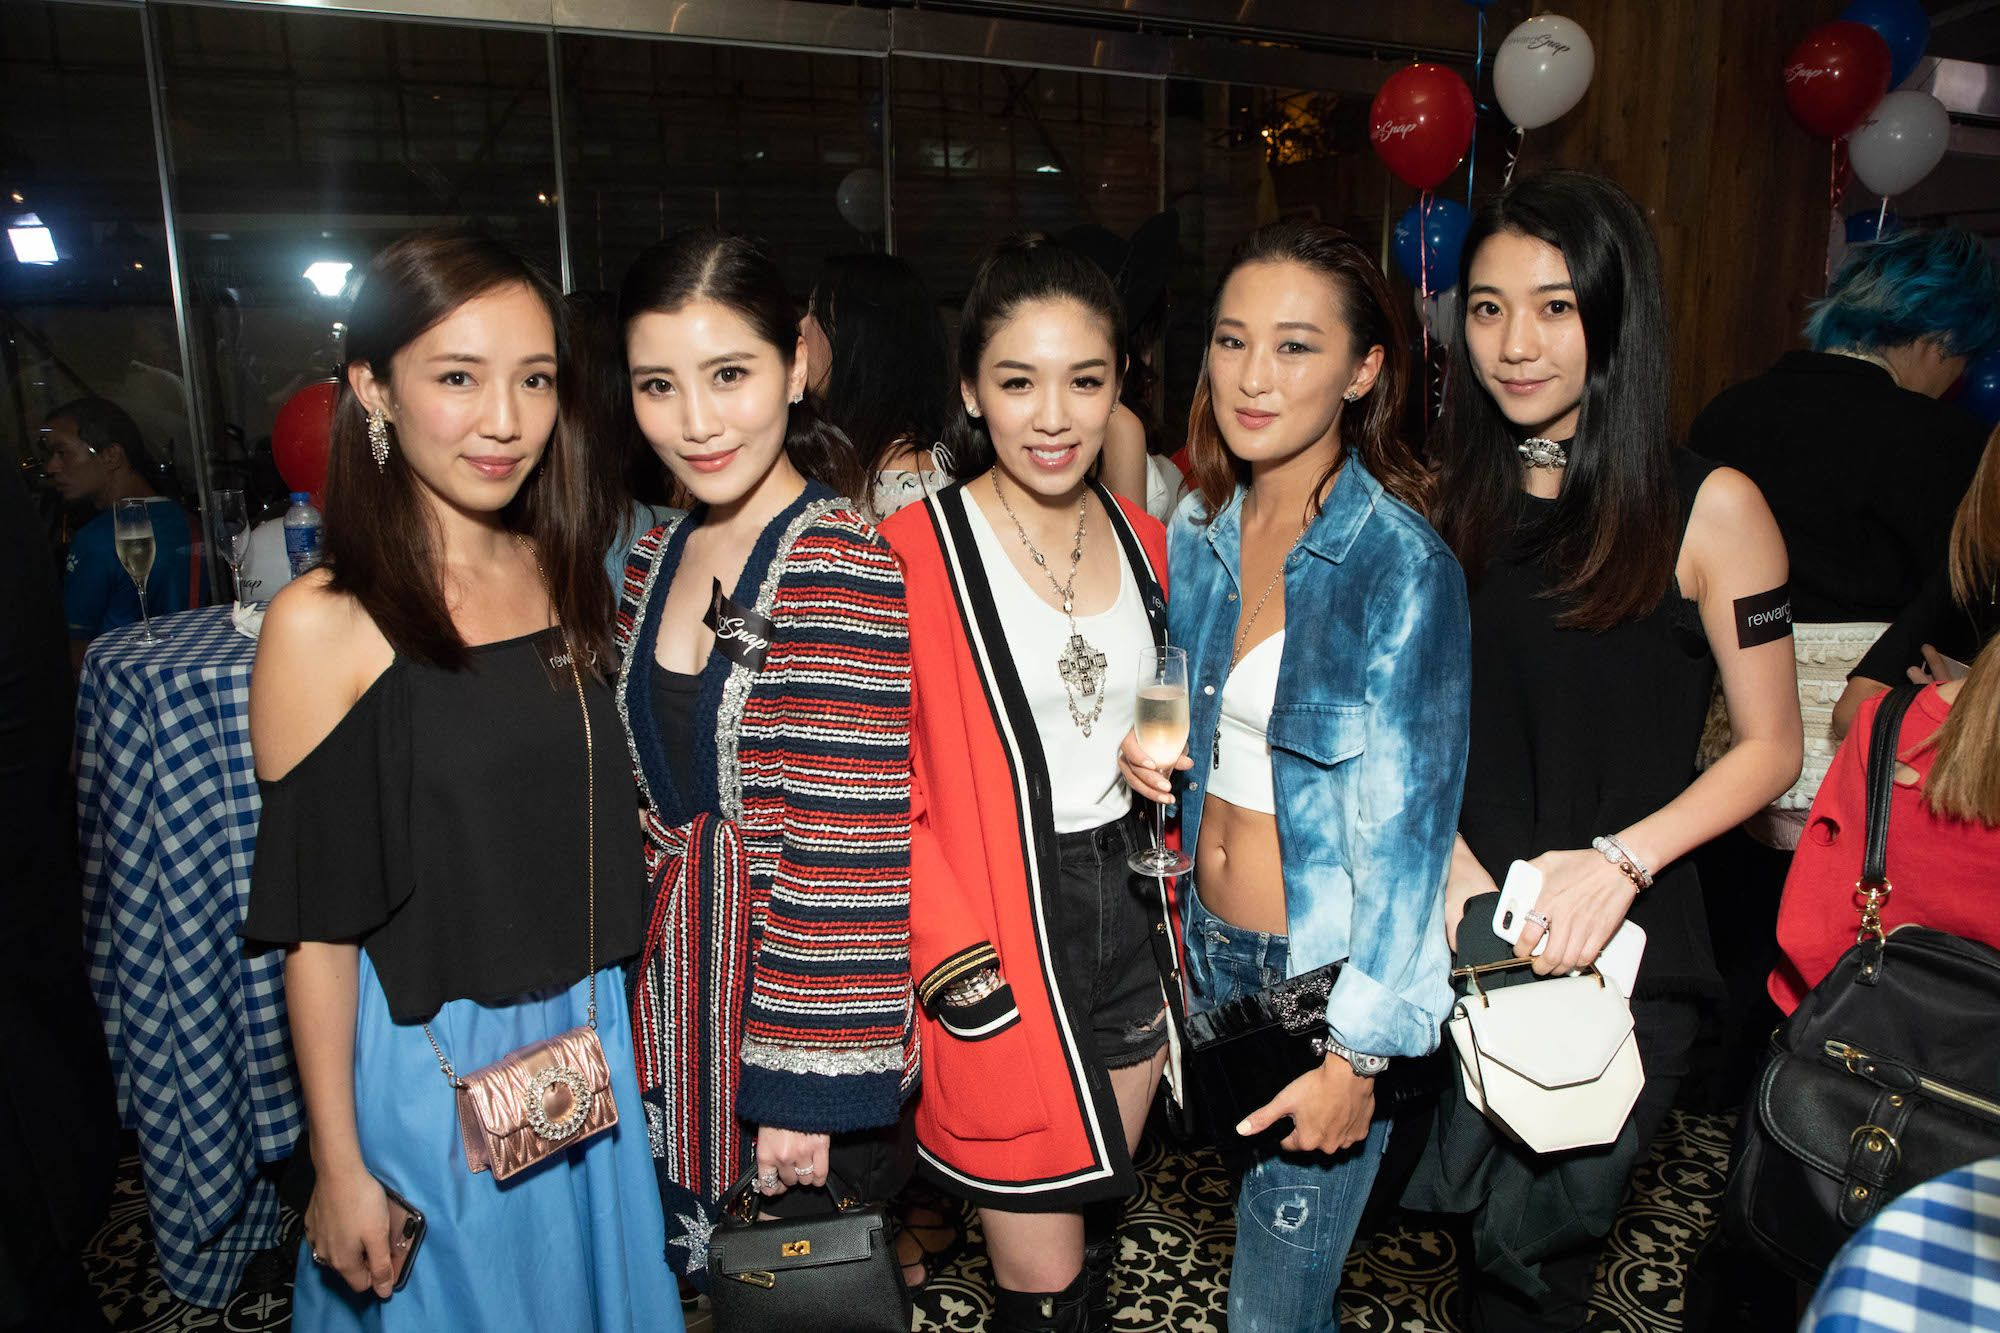 Christine Fok, Chryseis Tan, Carmen Yim, Antonia Li, Vincy Yeung